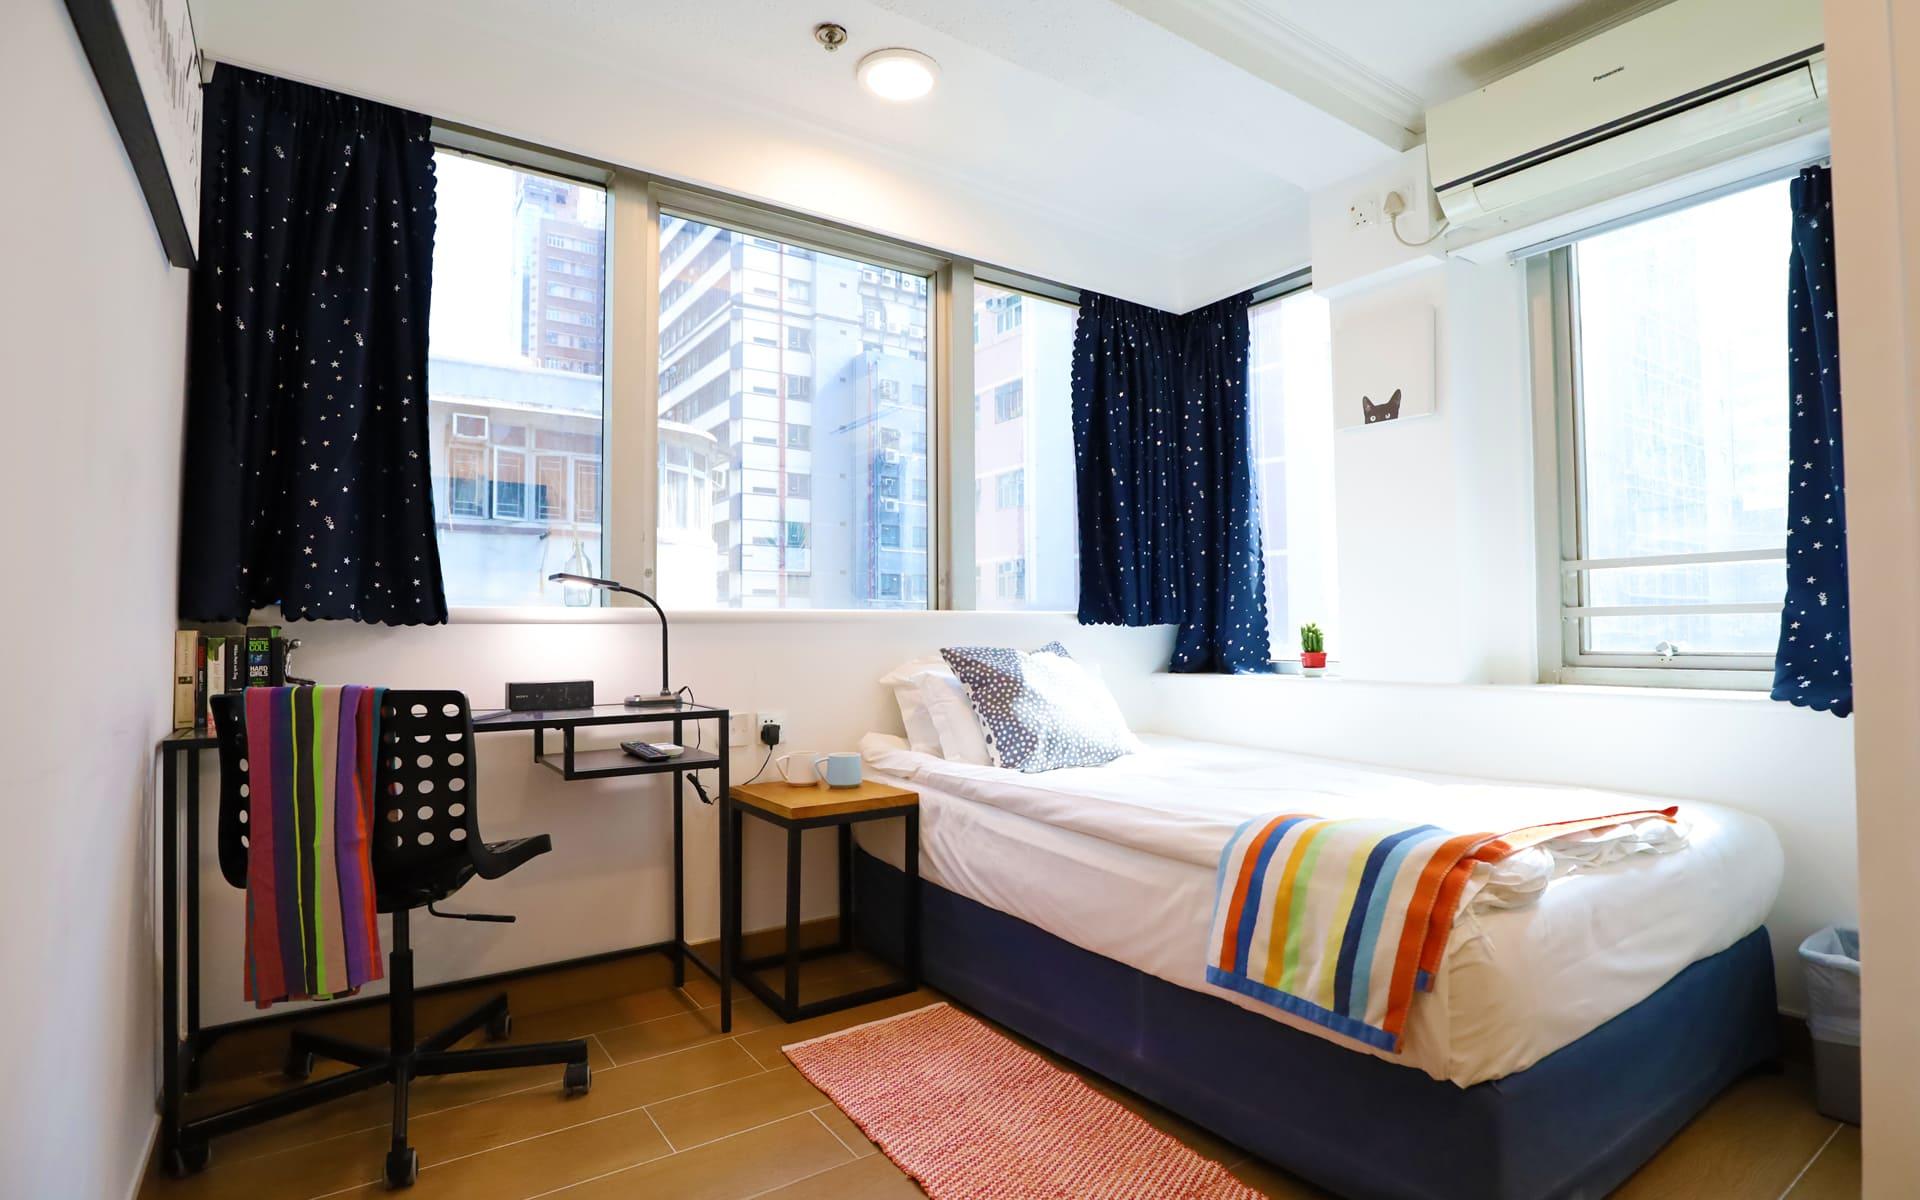 hk_service_apartment_3421387601596784649.jpg